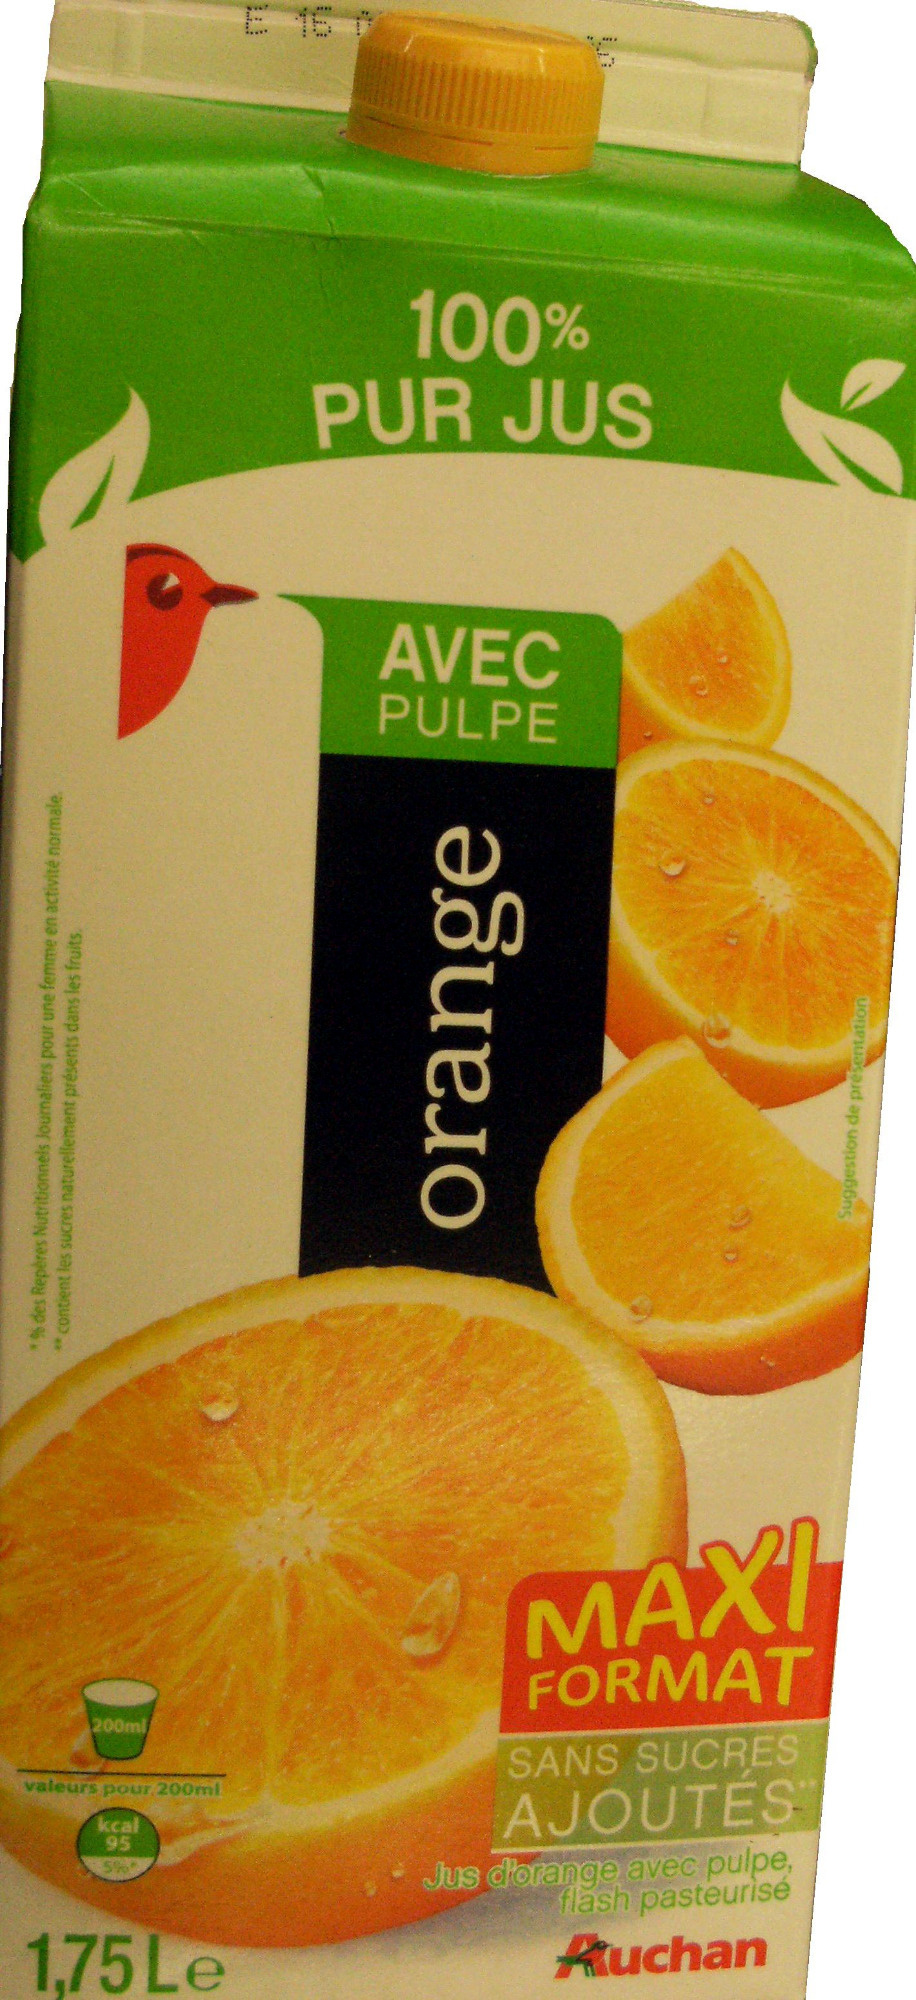 100 % Pur Jus orange (Avec Pulpe) - Product - fr